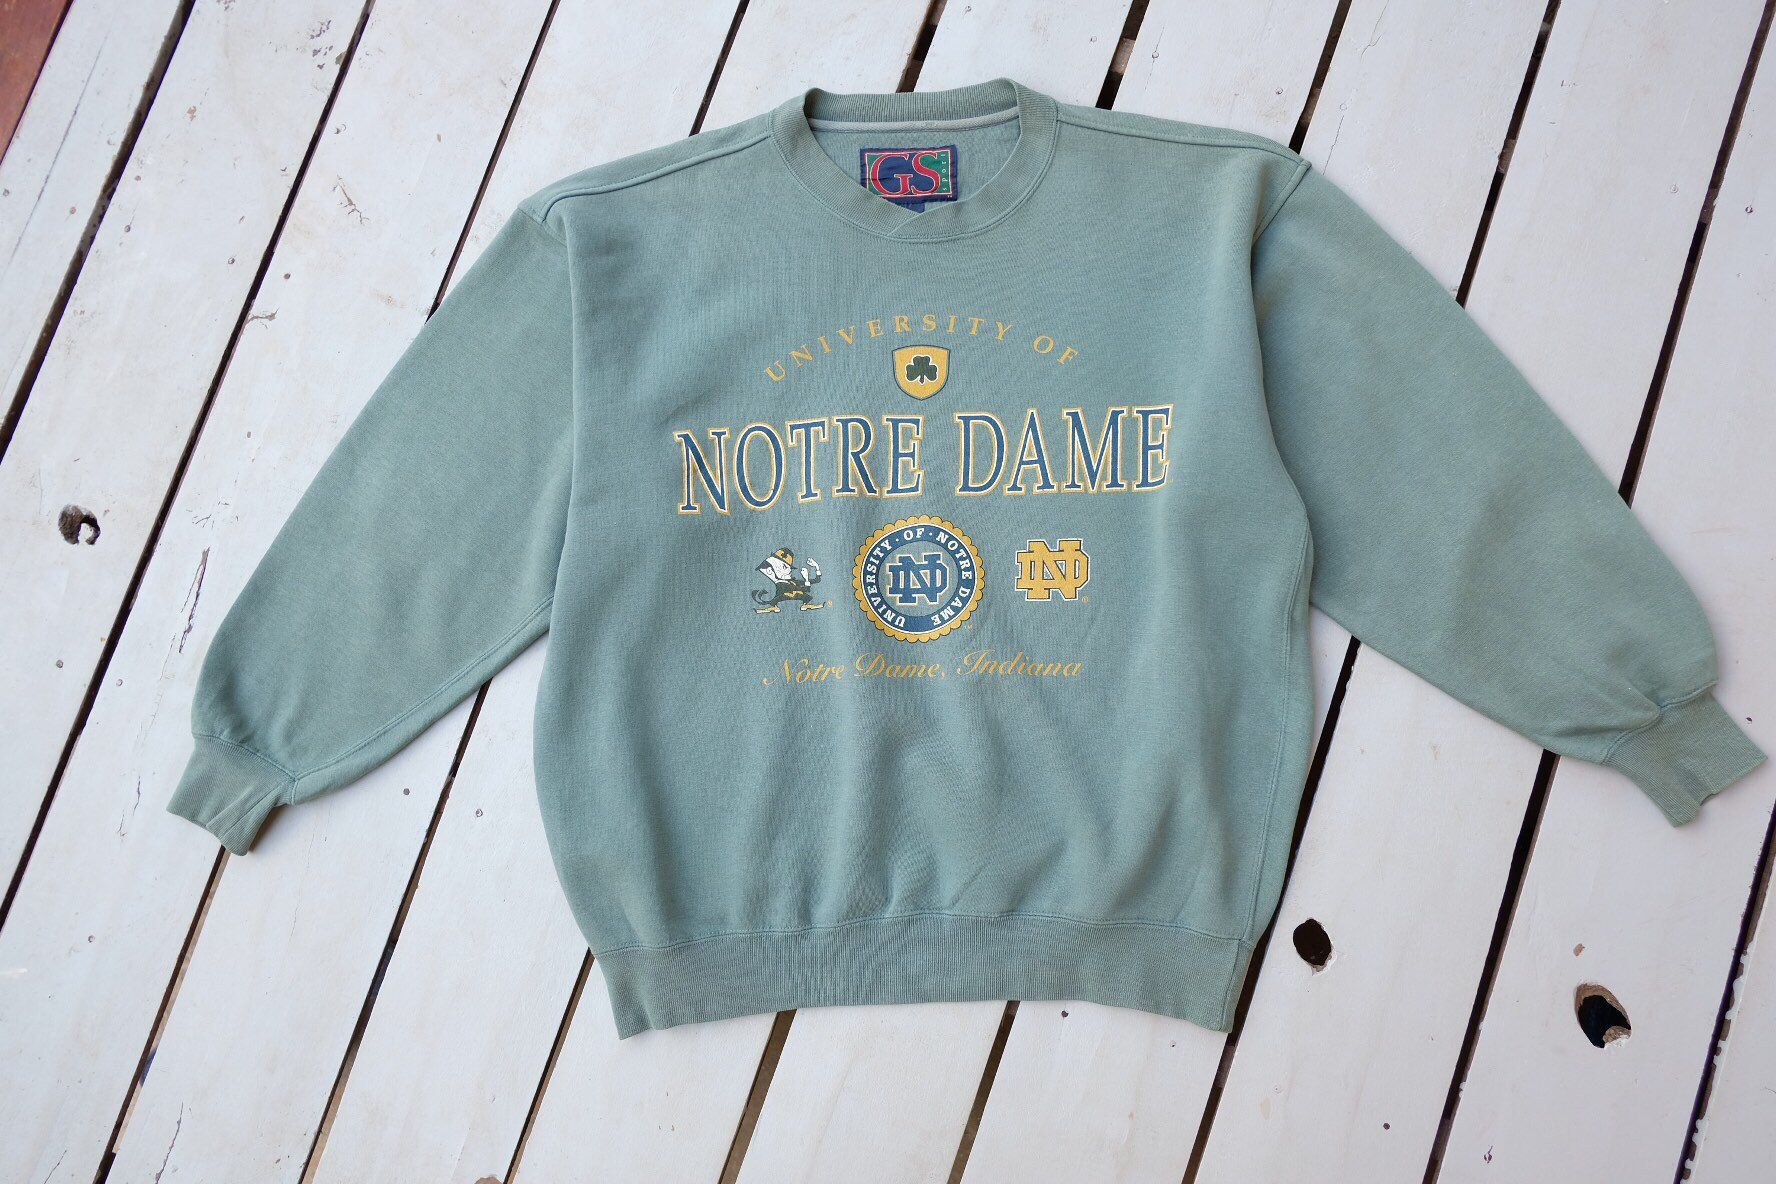 Vintage University Of Notre Dame Sweatshirt Green Light Etsy Notre Dame Sweatshirt Notre Dame Apparel Sweatshirts [ 1184 x 1776 Pixel ]